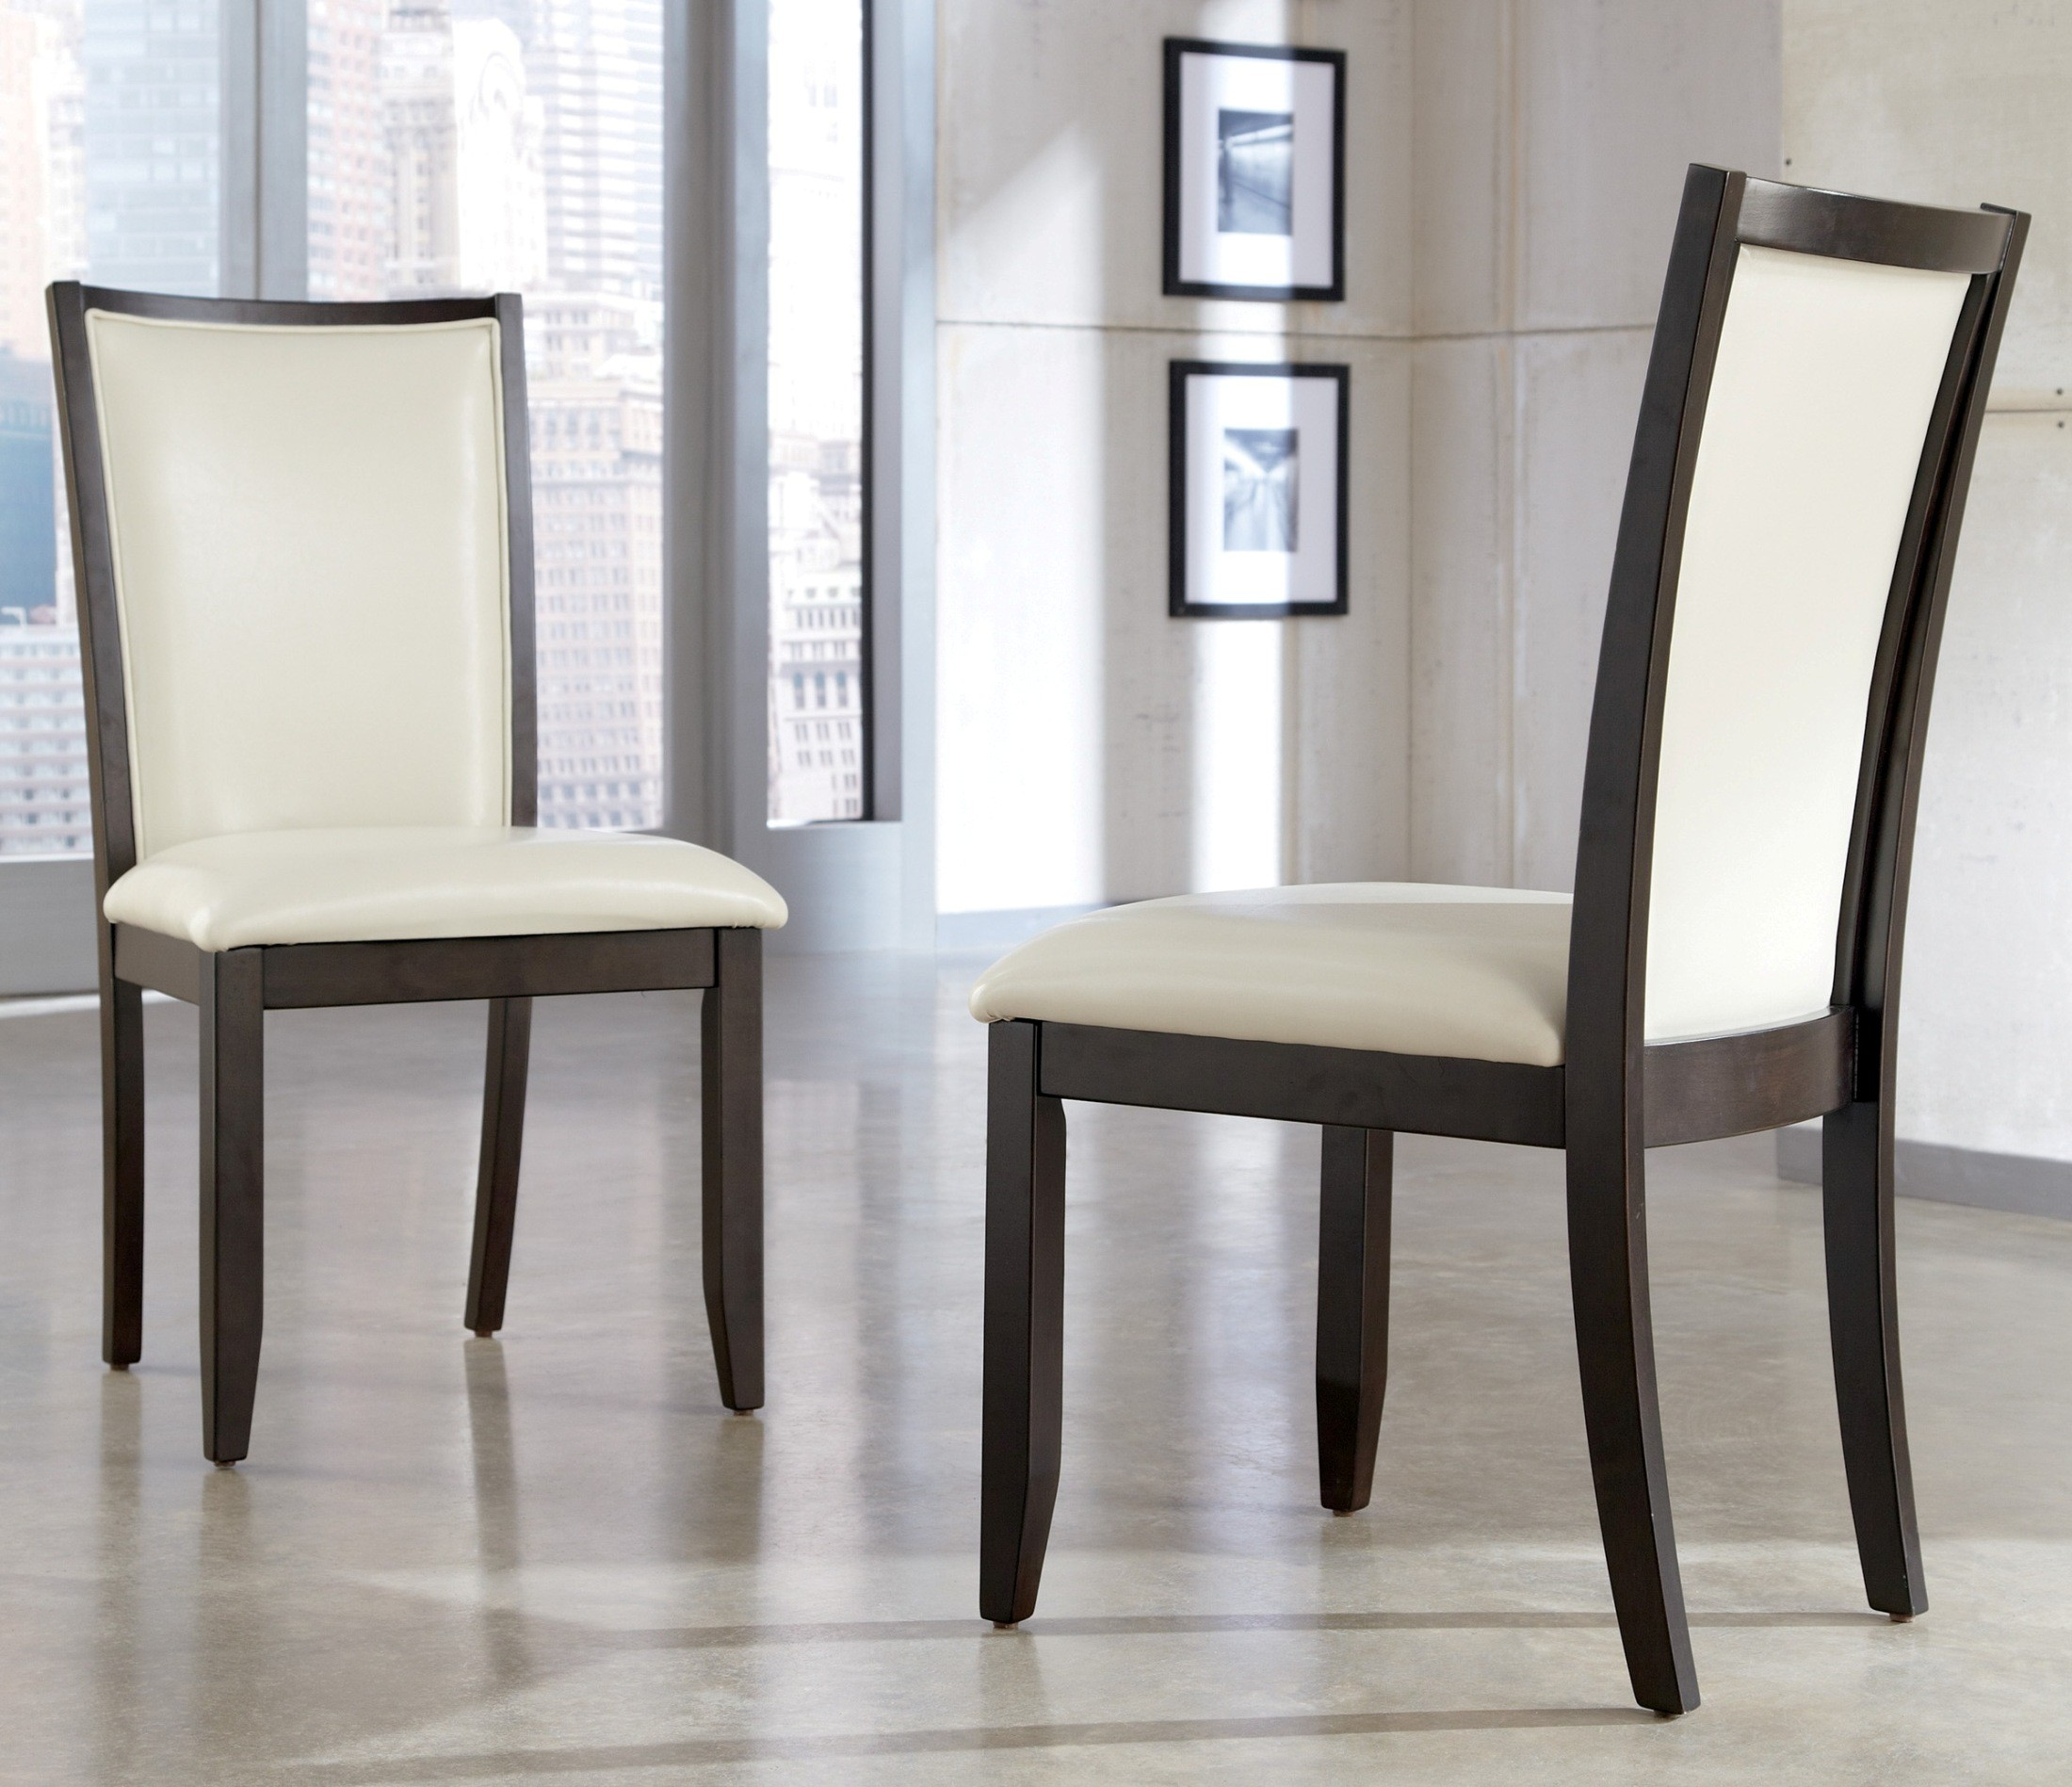 Cream Dining Set: Trishelle Dining Upholstered Cream Side Chair Set Of 2